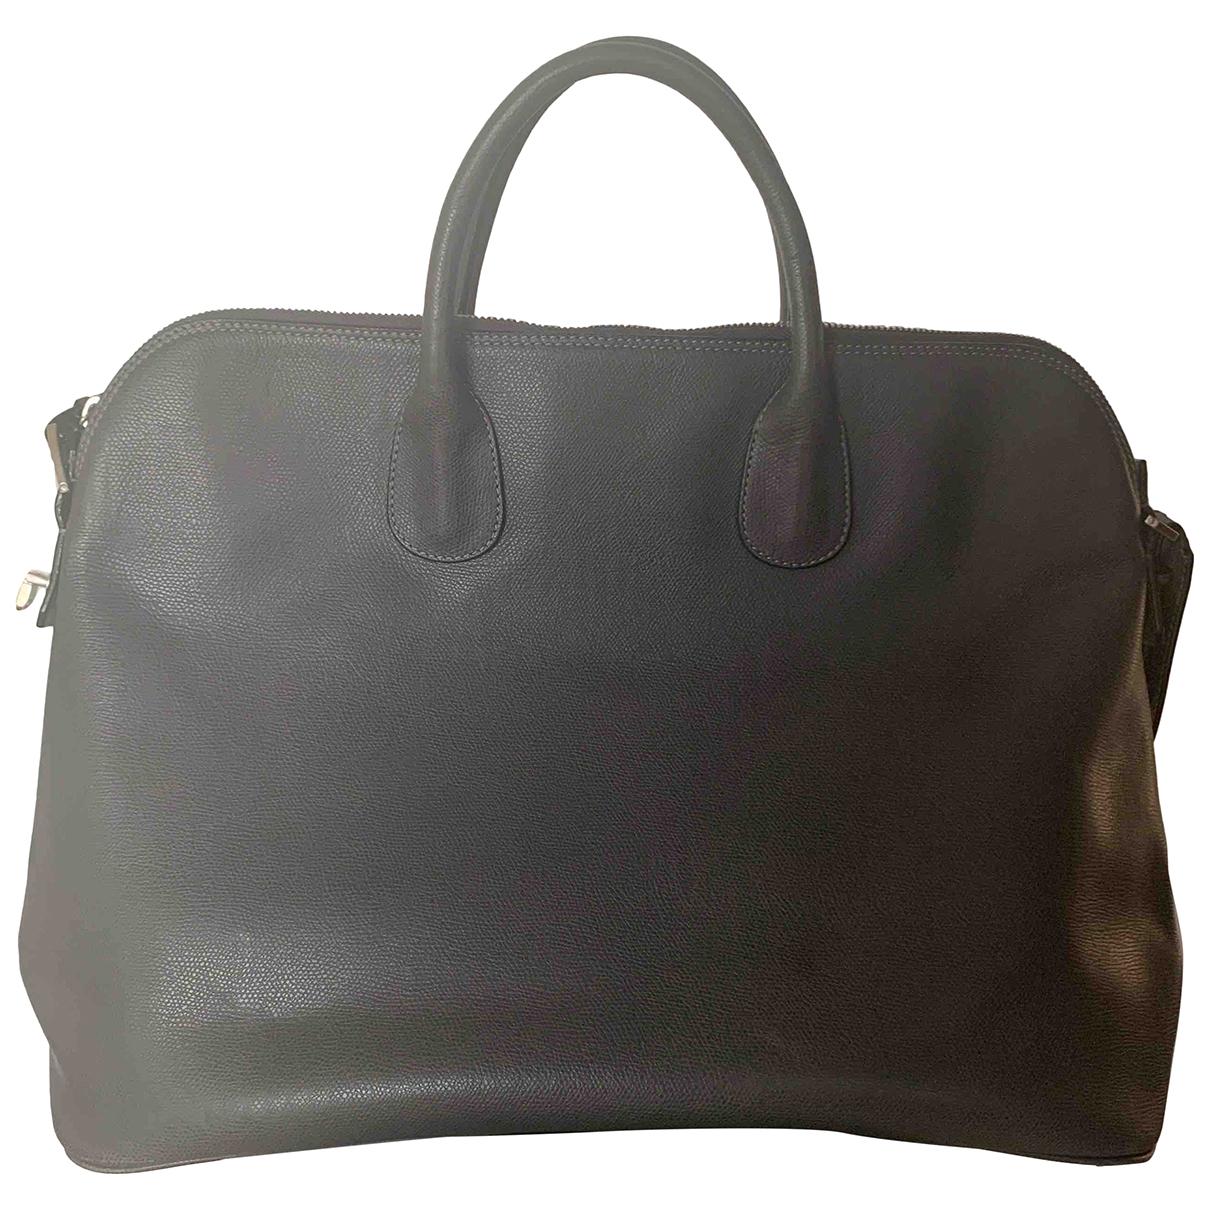 Valextra \N Anthracite Leather bag for Men \N